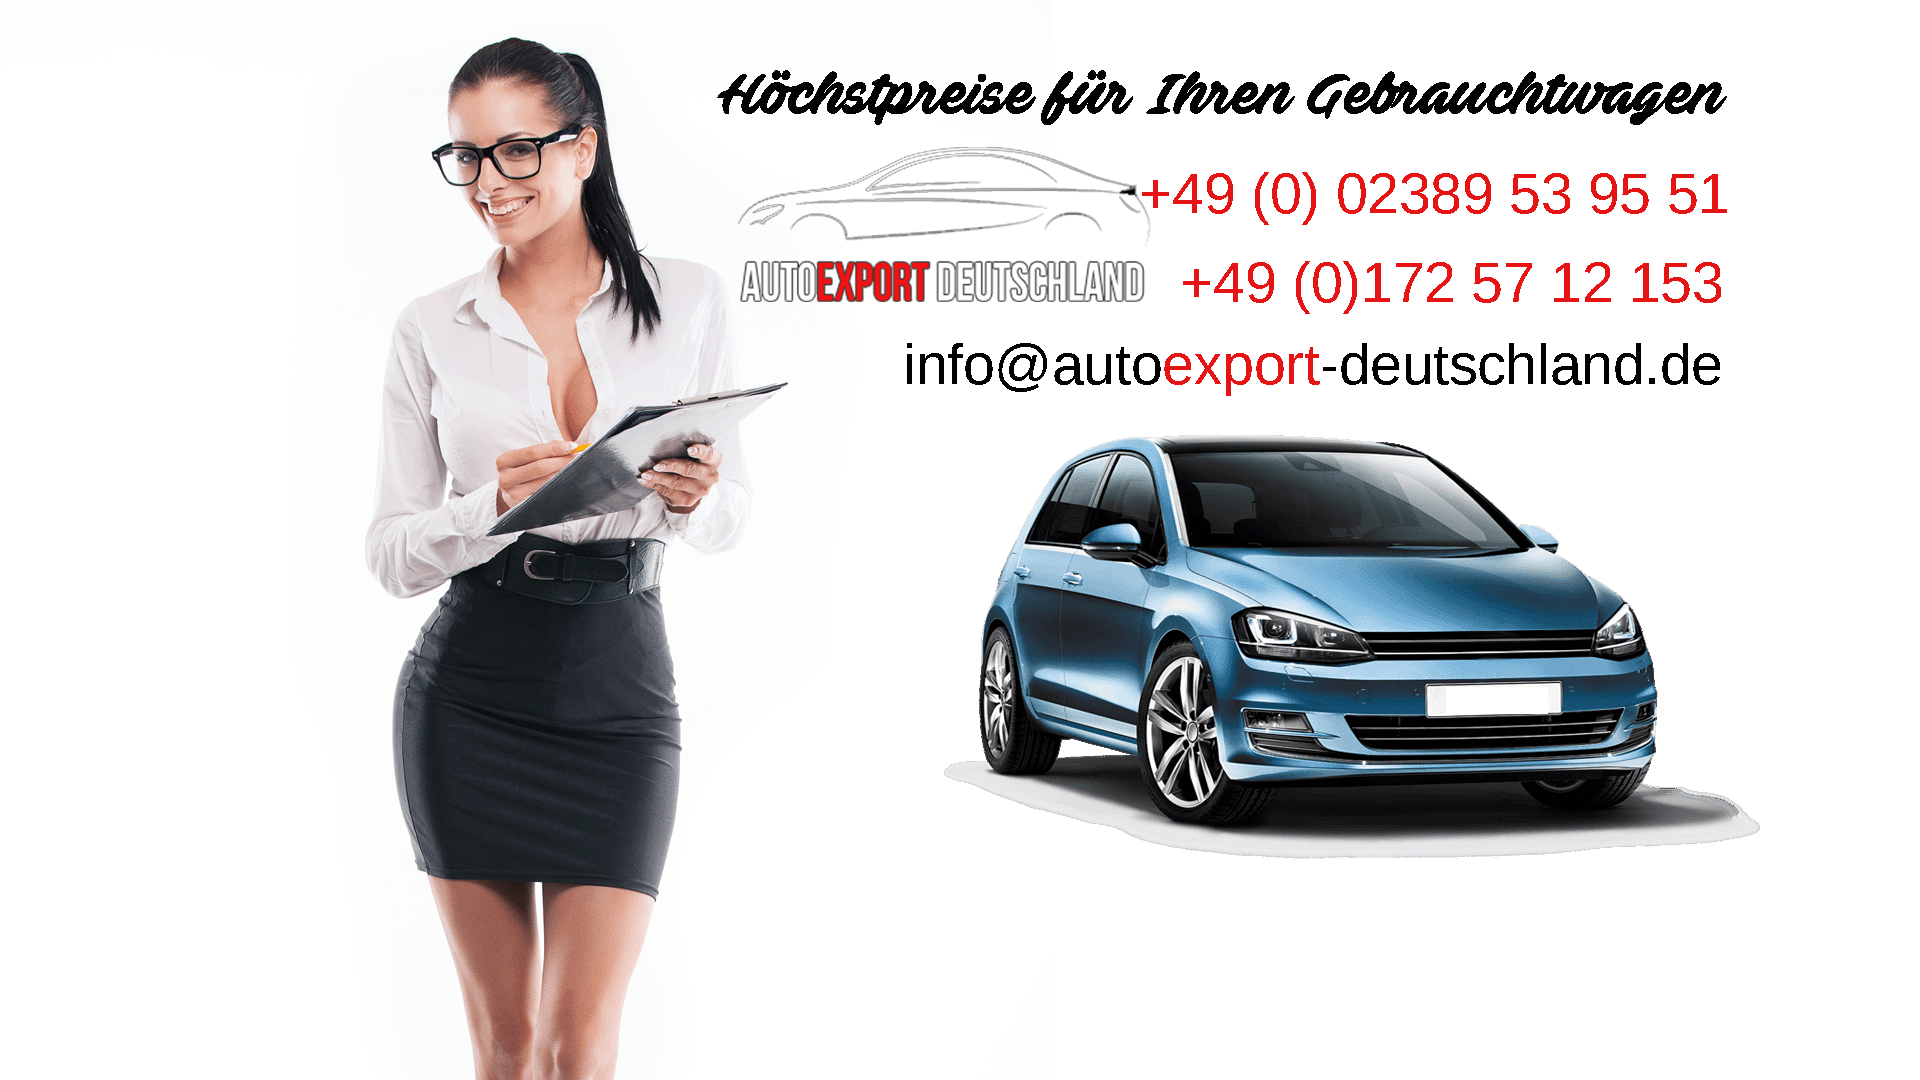 Autobörse Deutschland - Auto verkaufen - Autoankauf 0172 57 12 153